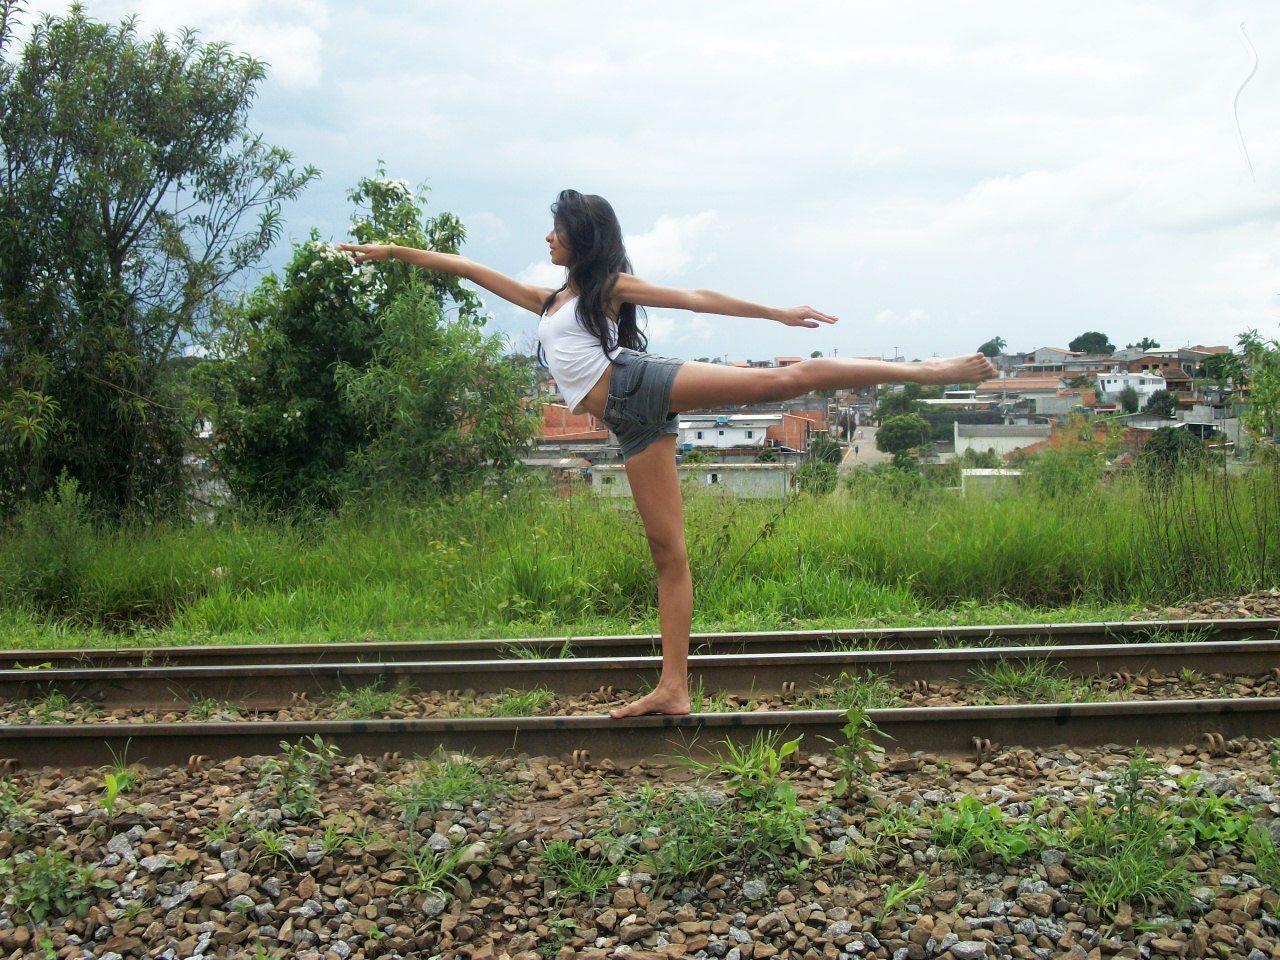 Carol Nakamura nude (36 photo) Hacked, iCloud, bra